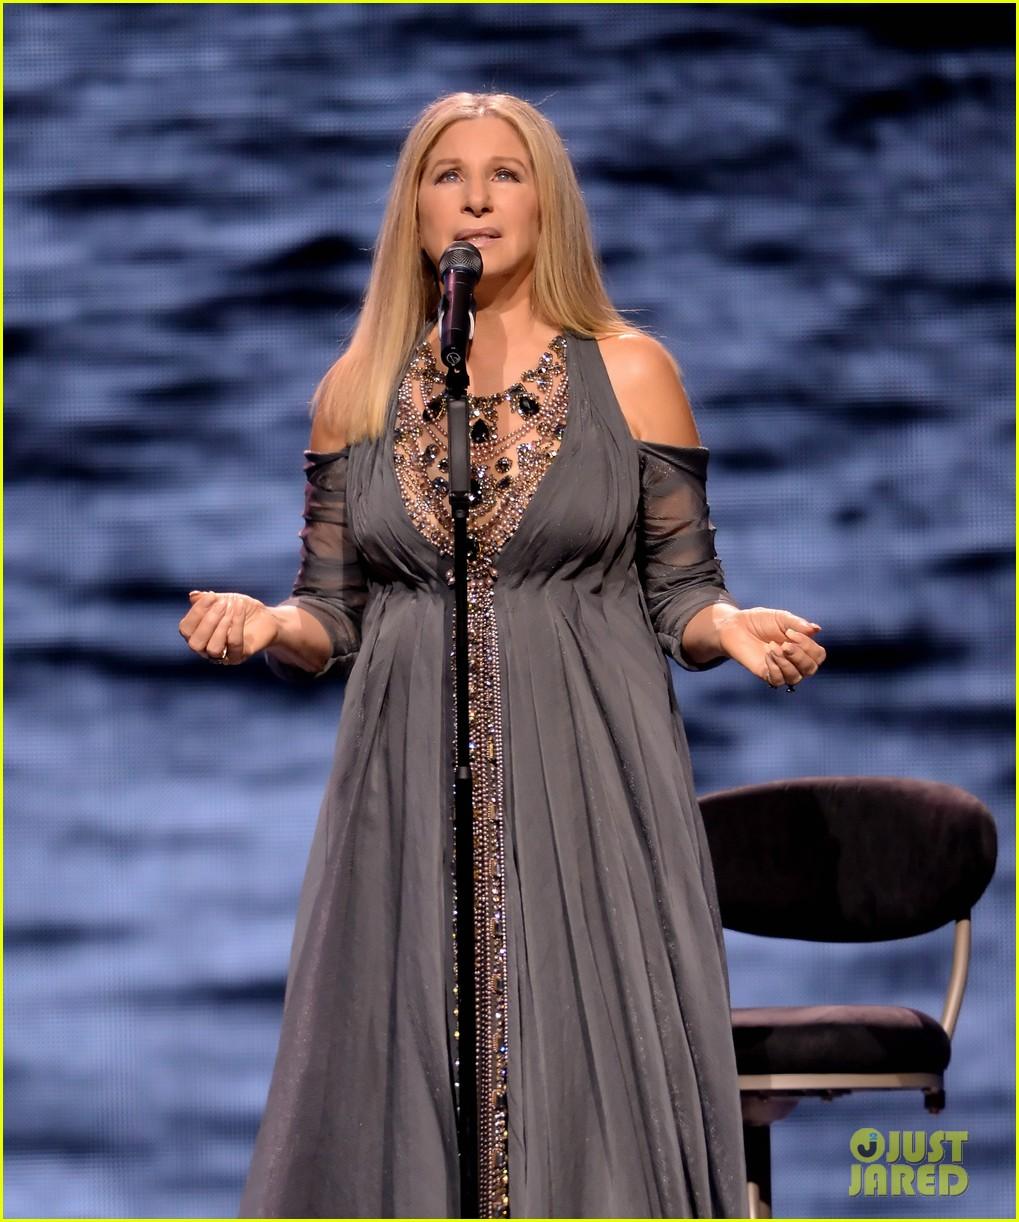 Barbra Streisand Kicks Off Tour In Los Angeles Photo